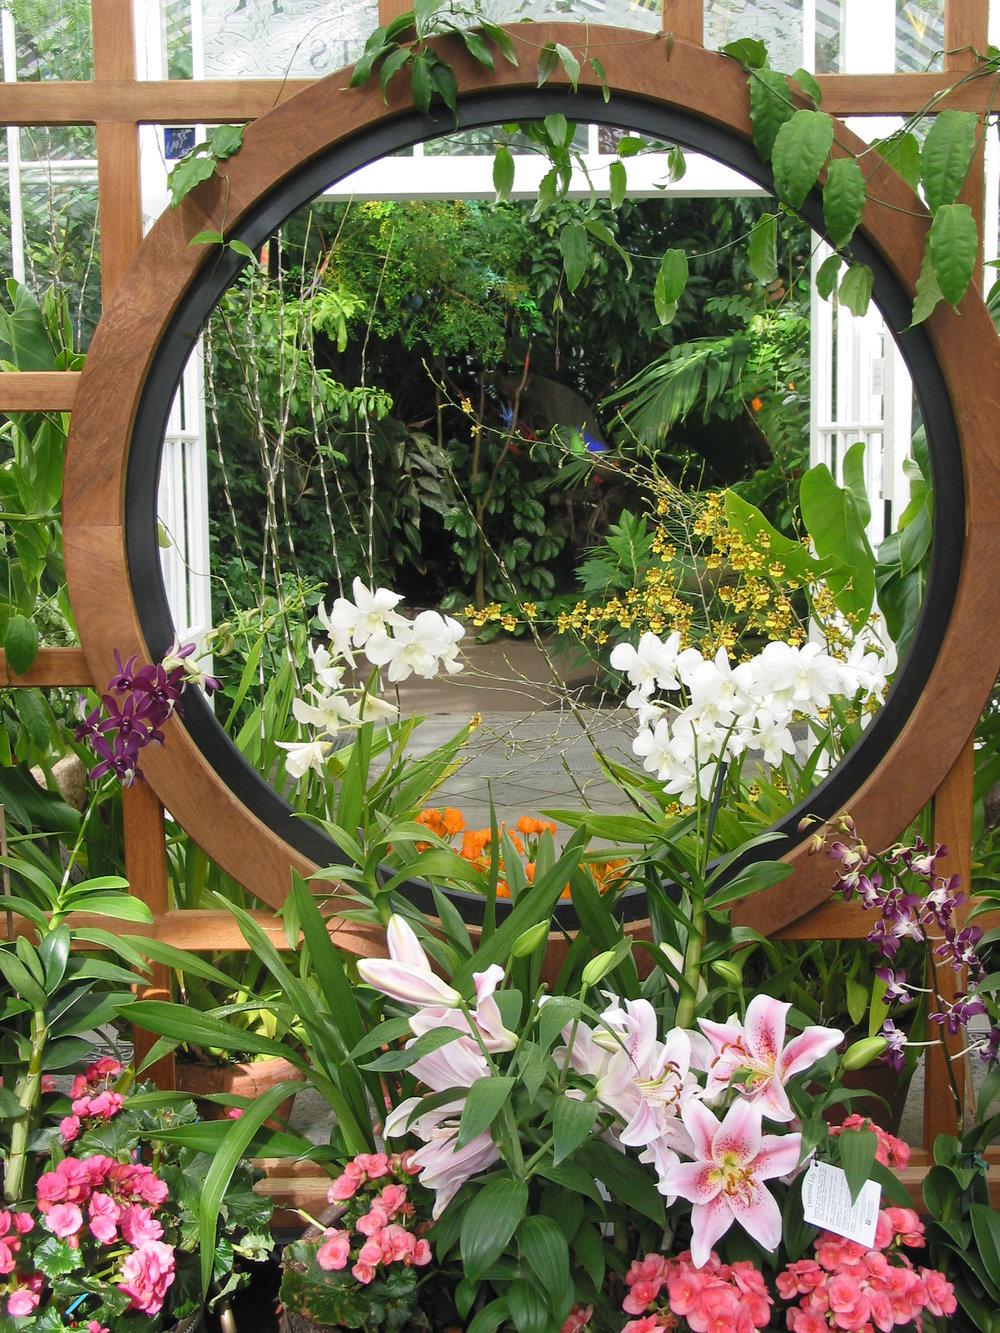 Conservatory_flowers.JPG